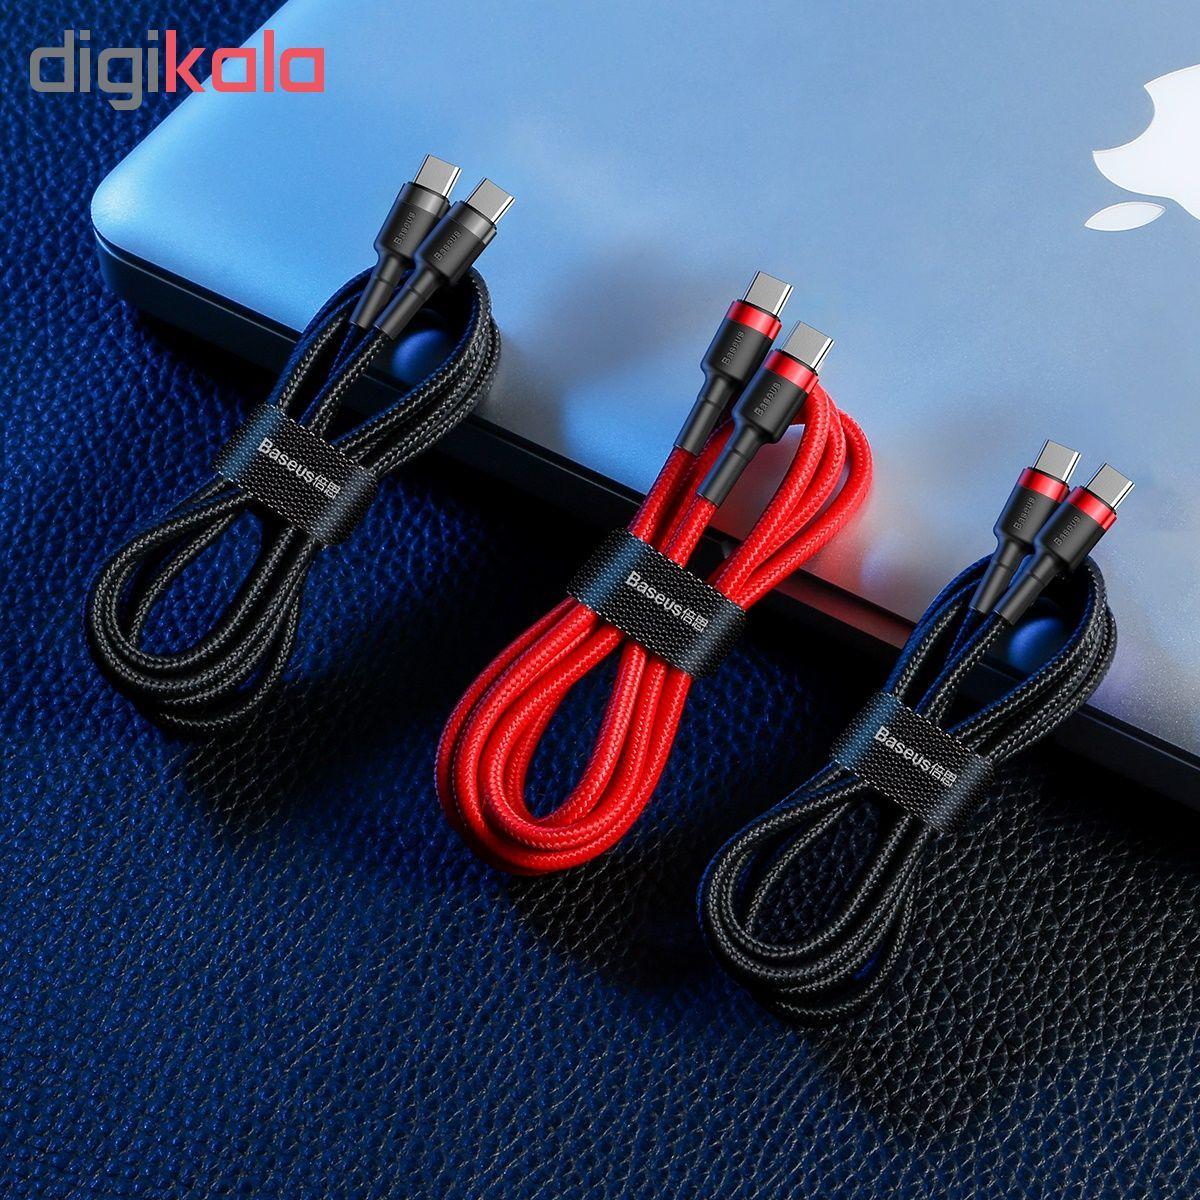 کابل USB-C باسئوس مدل CATKLF-H91 طول 2 متر main 1 5